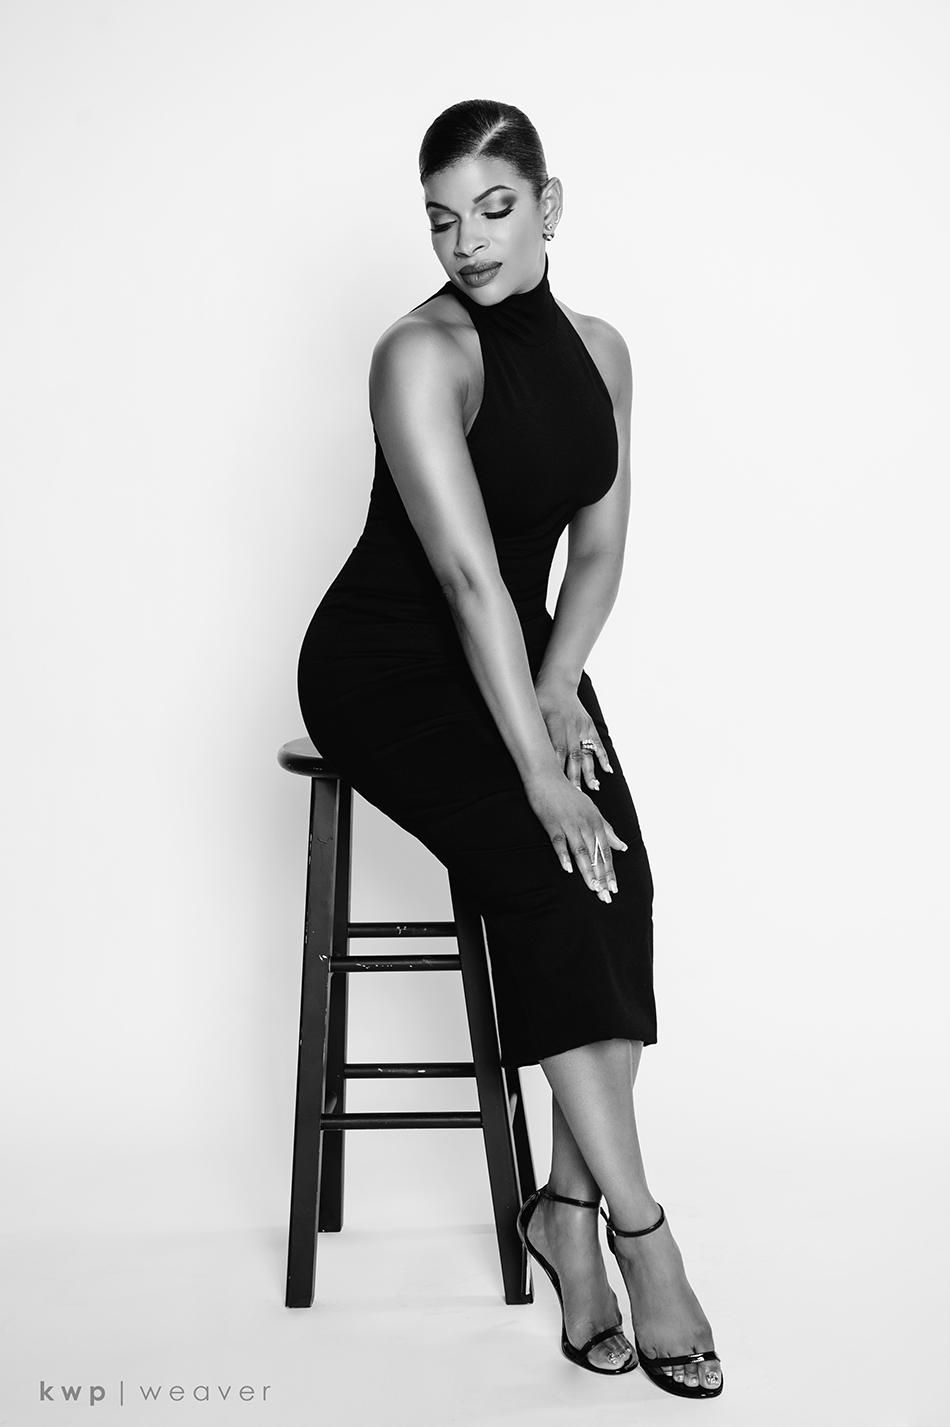 Kristen Weaver Photography Professional Studio Headshots